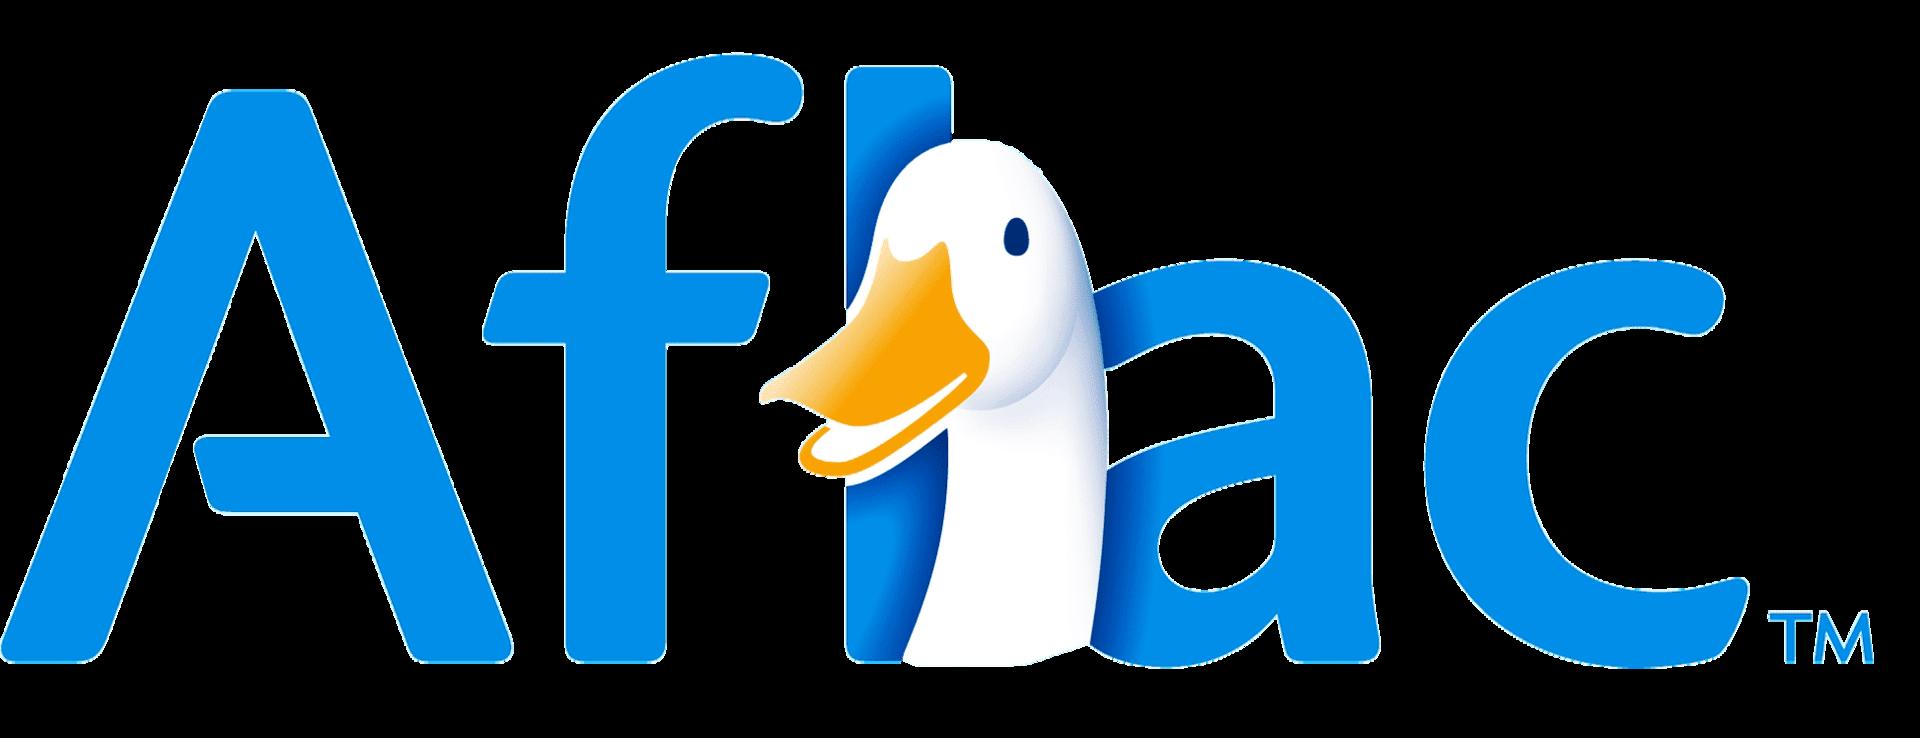 The head of a duck, cartoon style